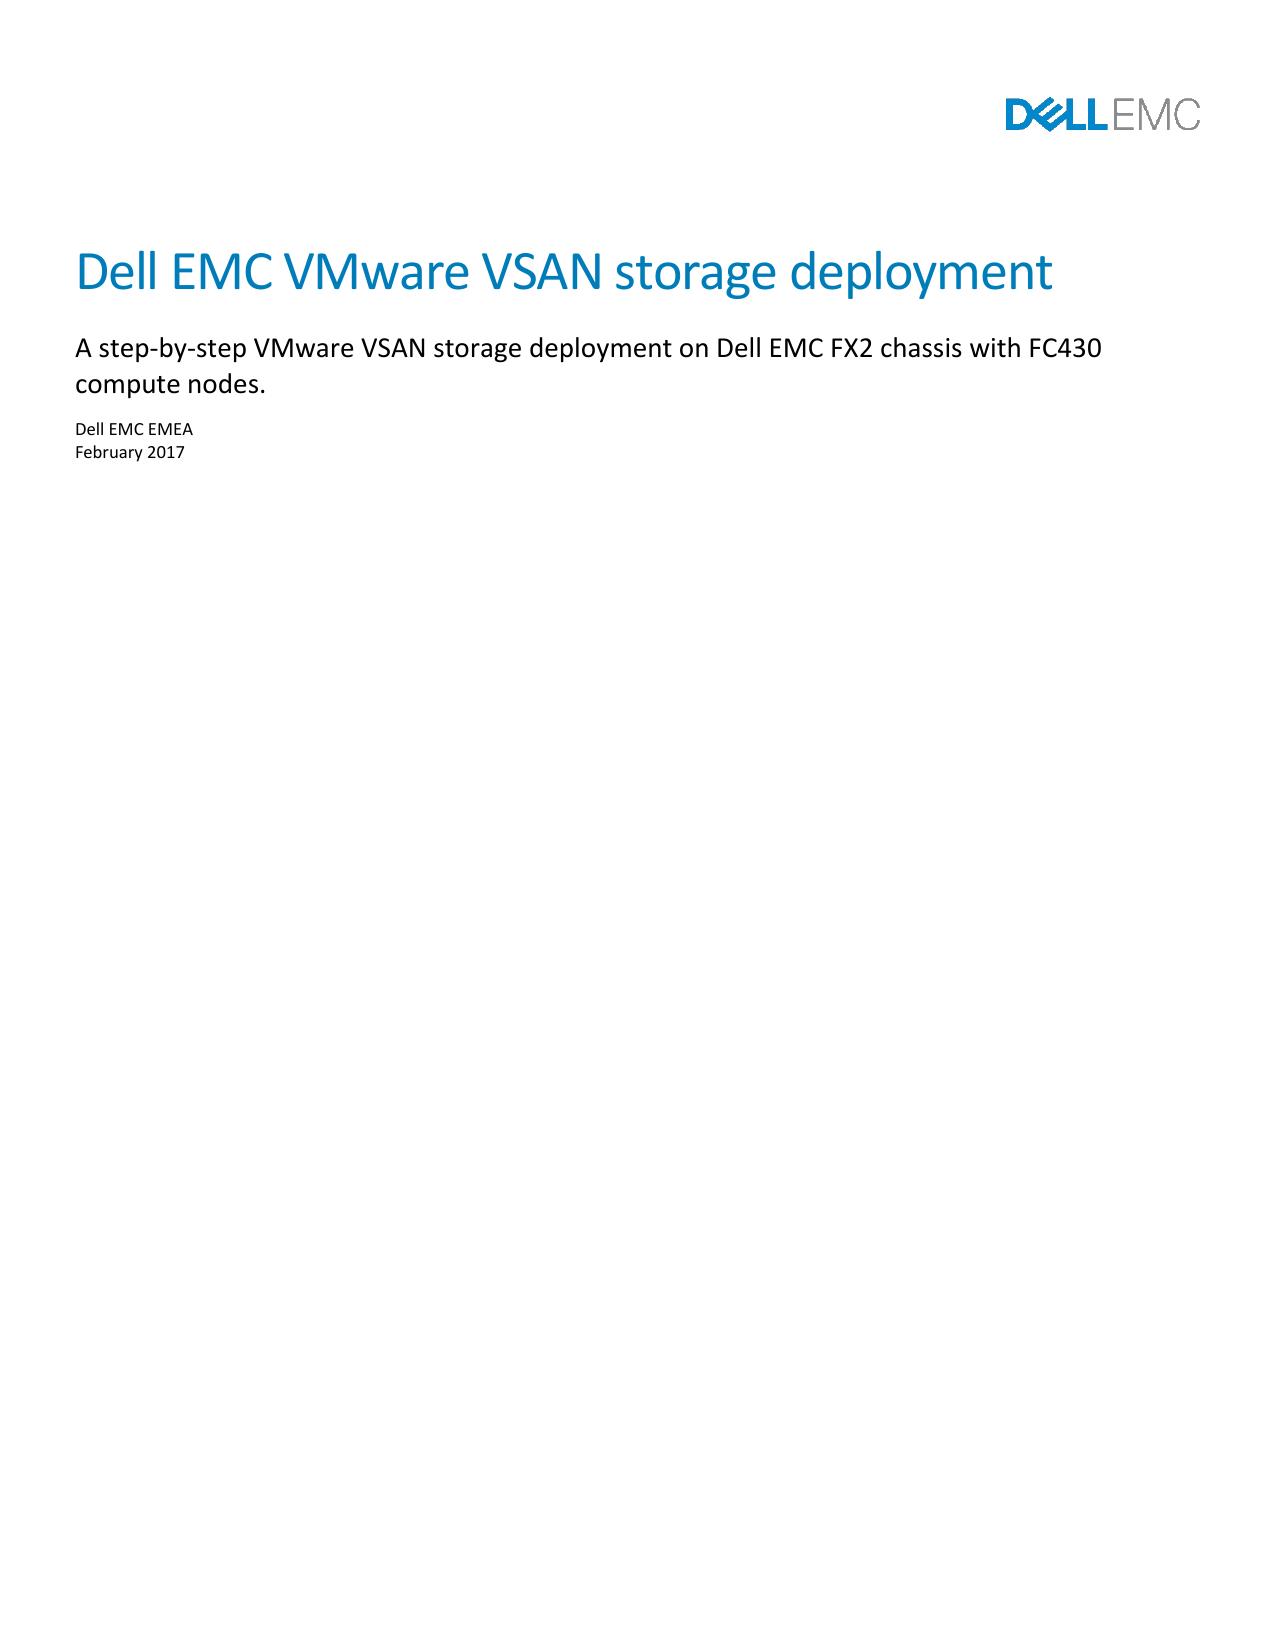 Dell EMC VMware VSAN storage deployment | manualzz com